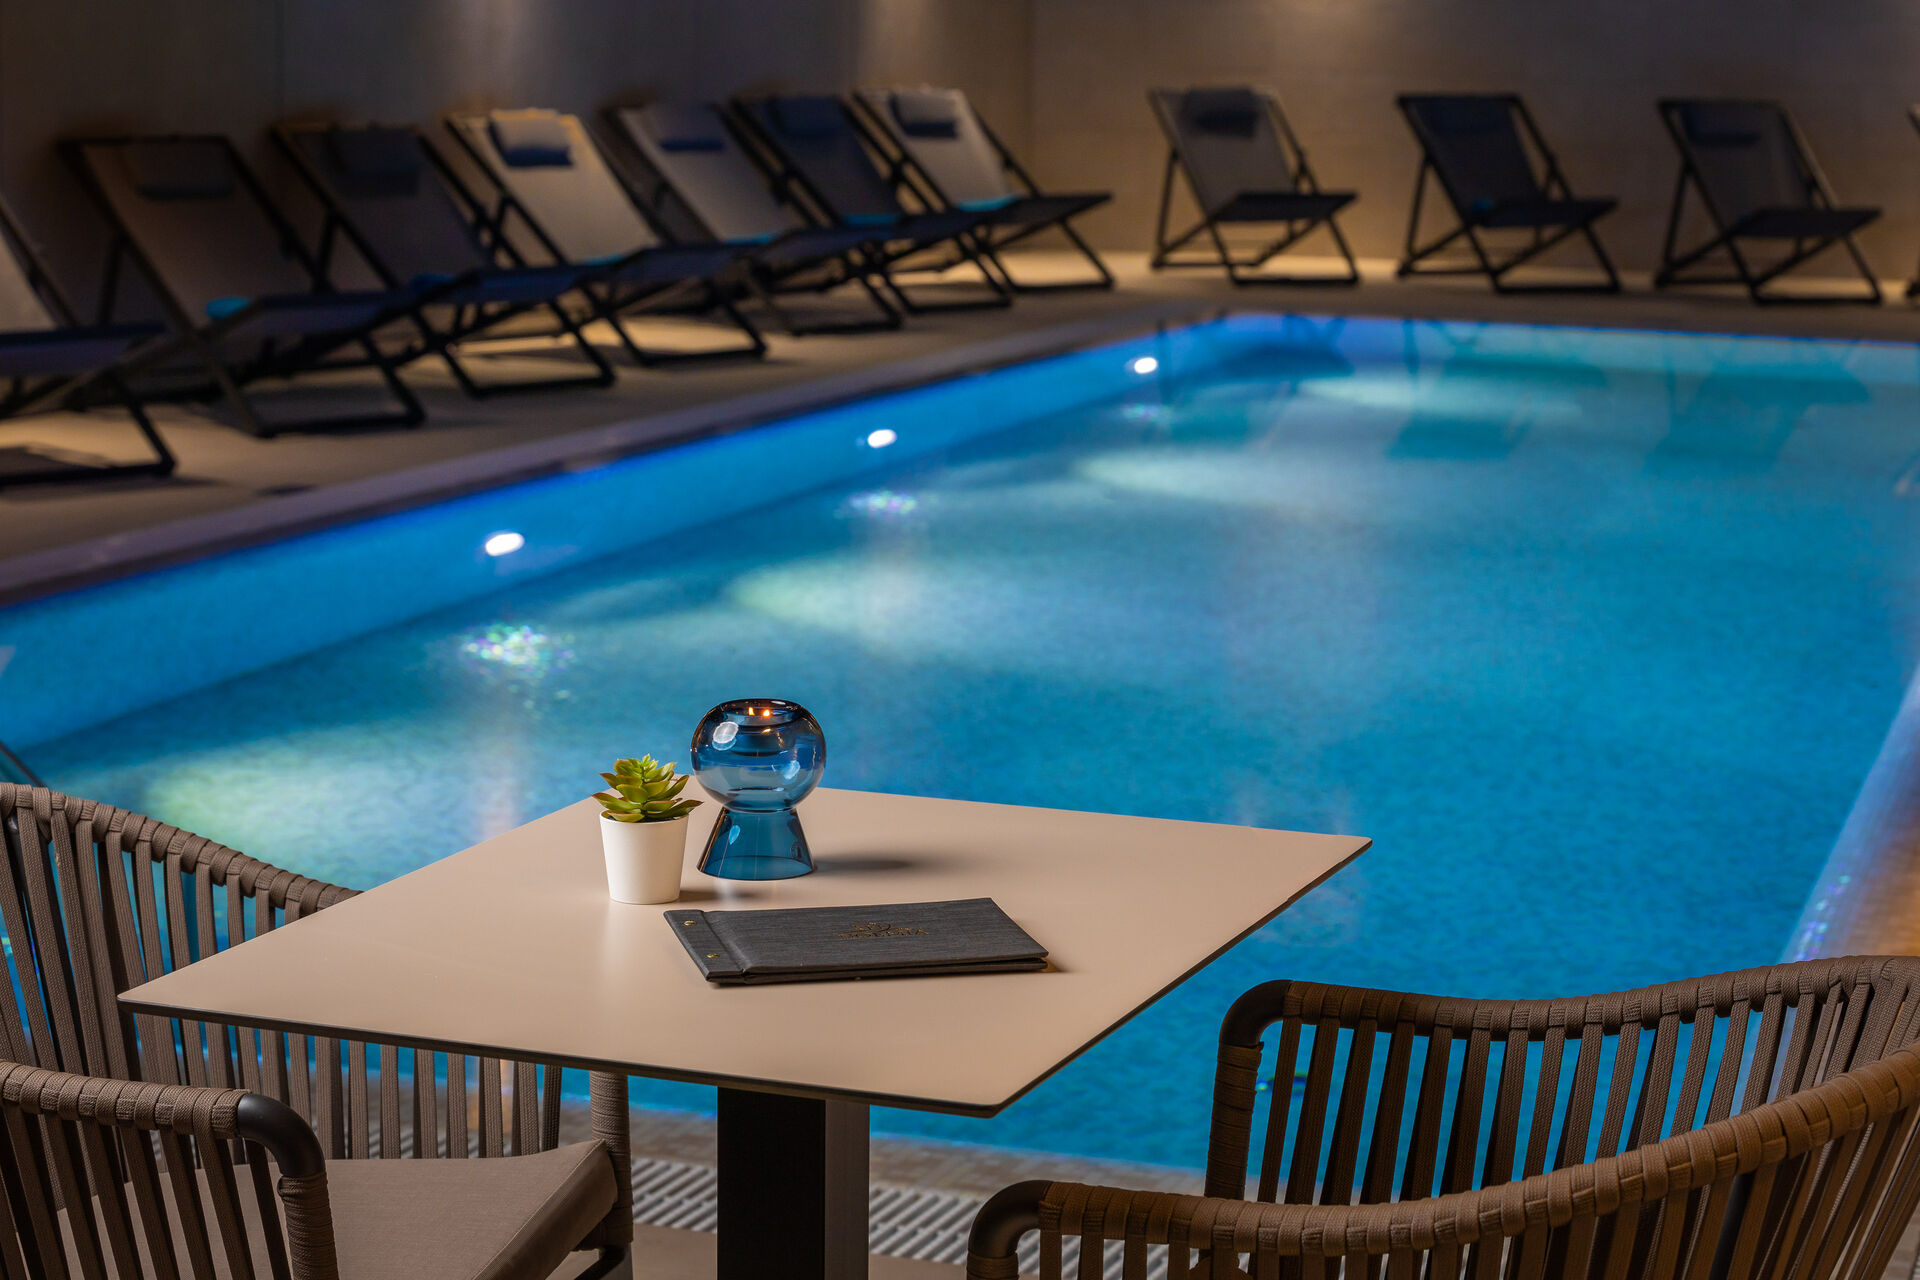 https://cms.satur.sk/data/imgs/tour_image/orig/outdoor-pool_hotel-noemia-4-1949959.jpg